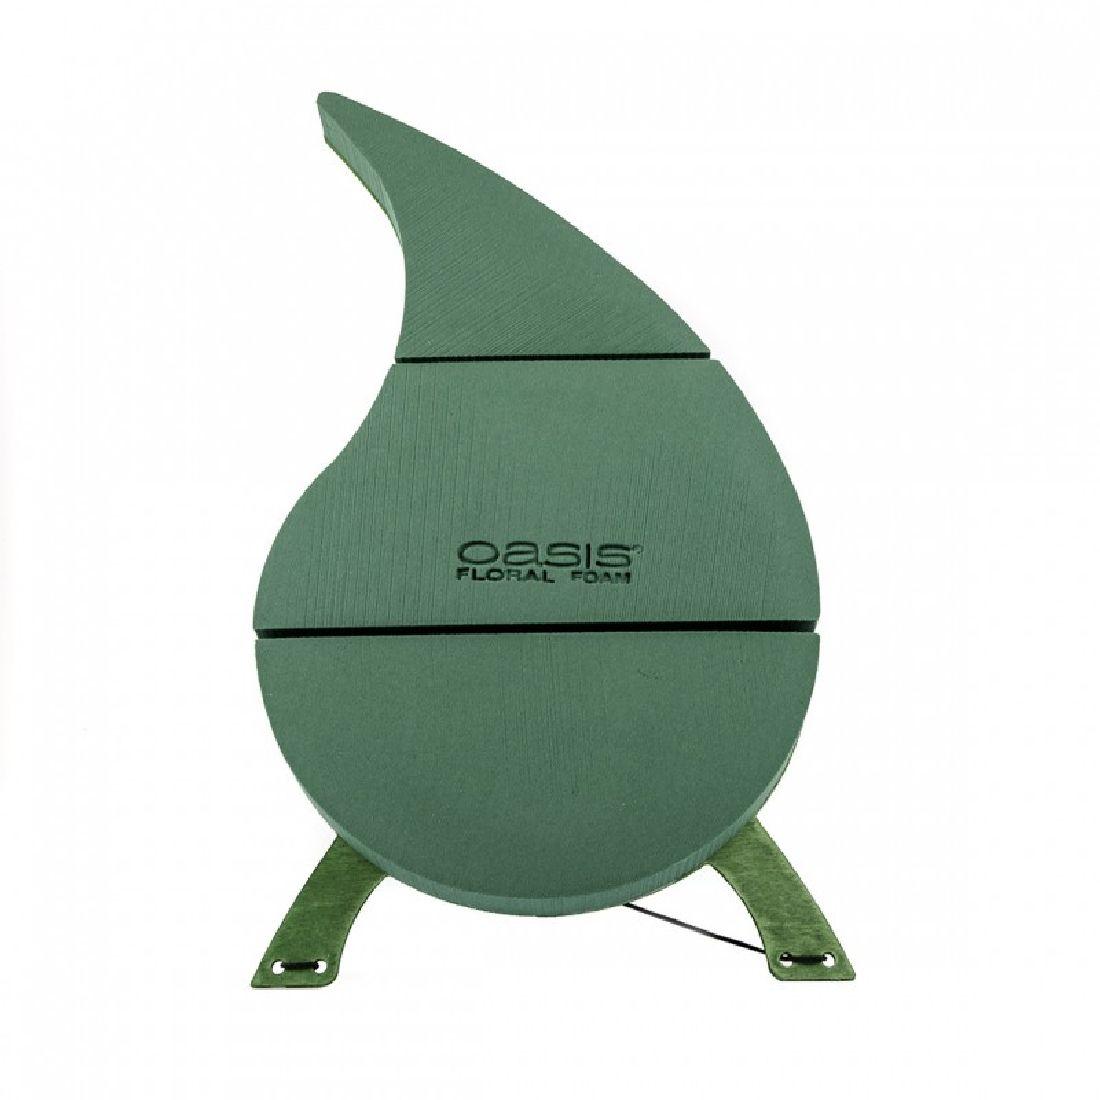 Oasis® Bioline® GRÜN 11-00160 Träne 57x34x5,2 cm